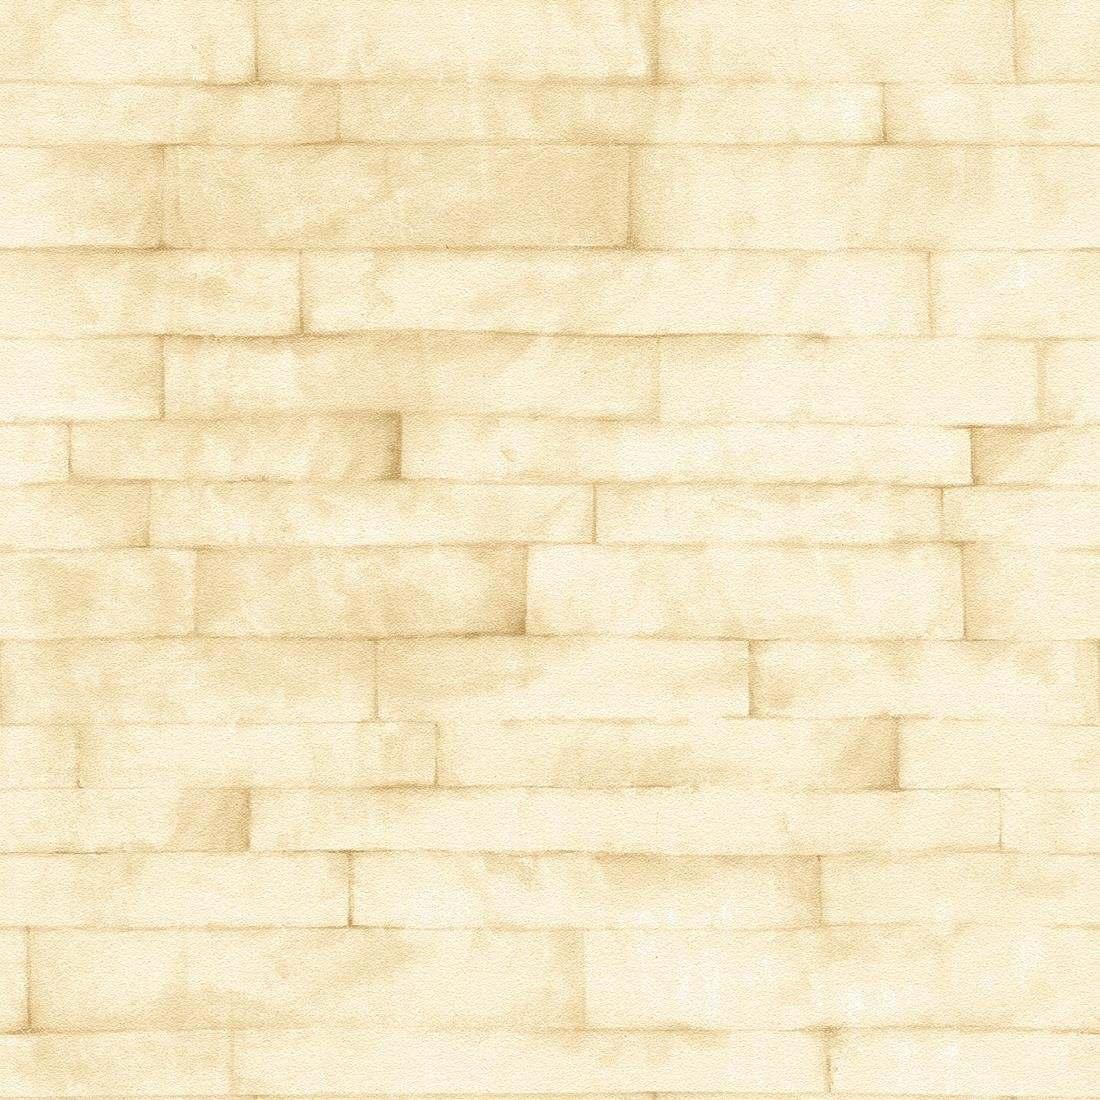 Papel parede tijolo branco 10 metros x 52cm bobinex for Papel decorativo pared infantil